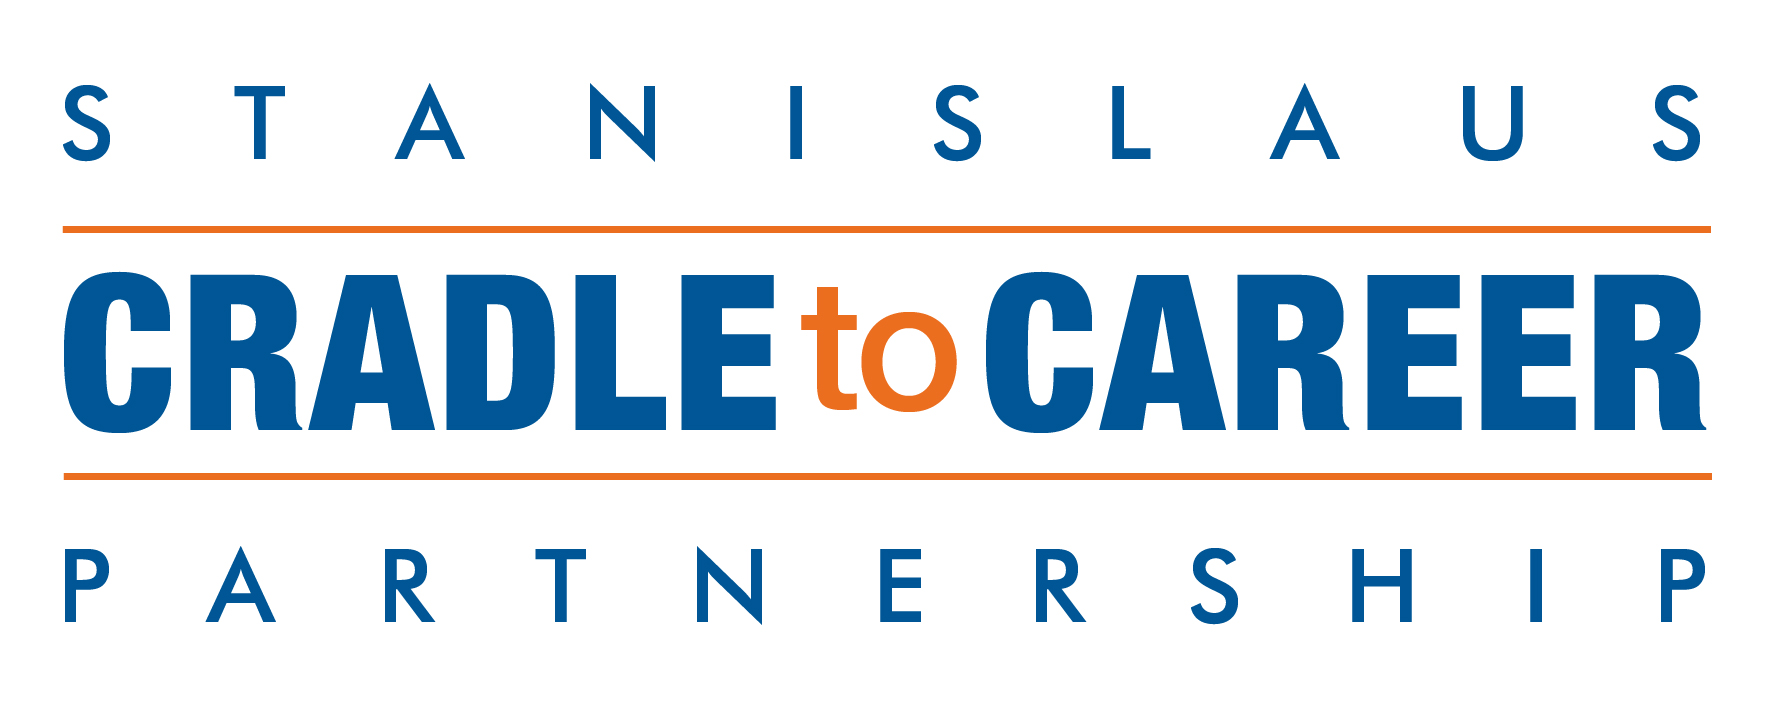 Cradle to Career logo